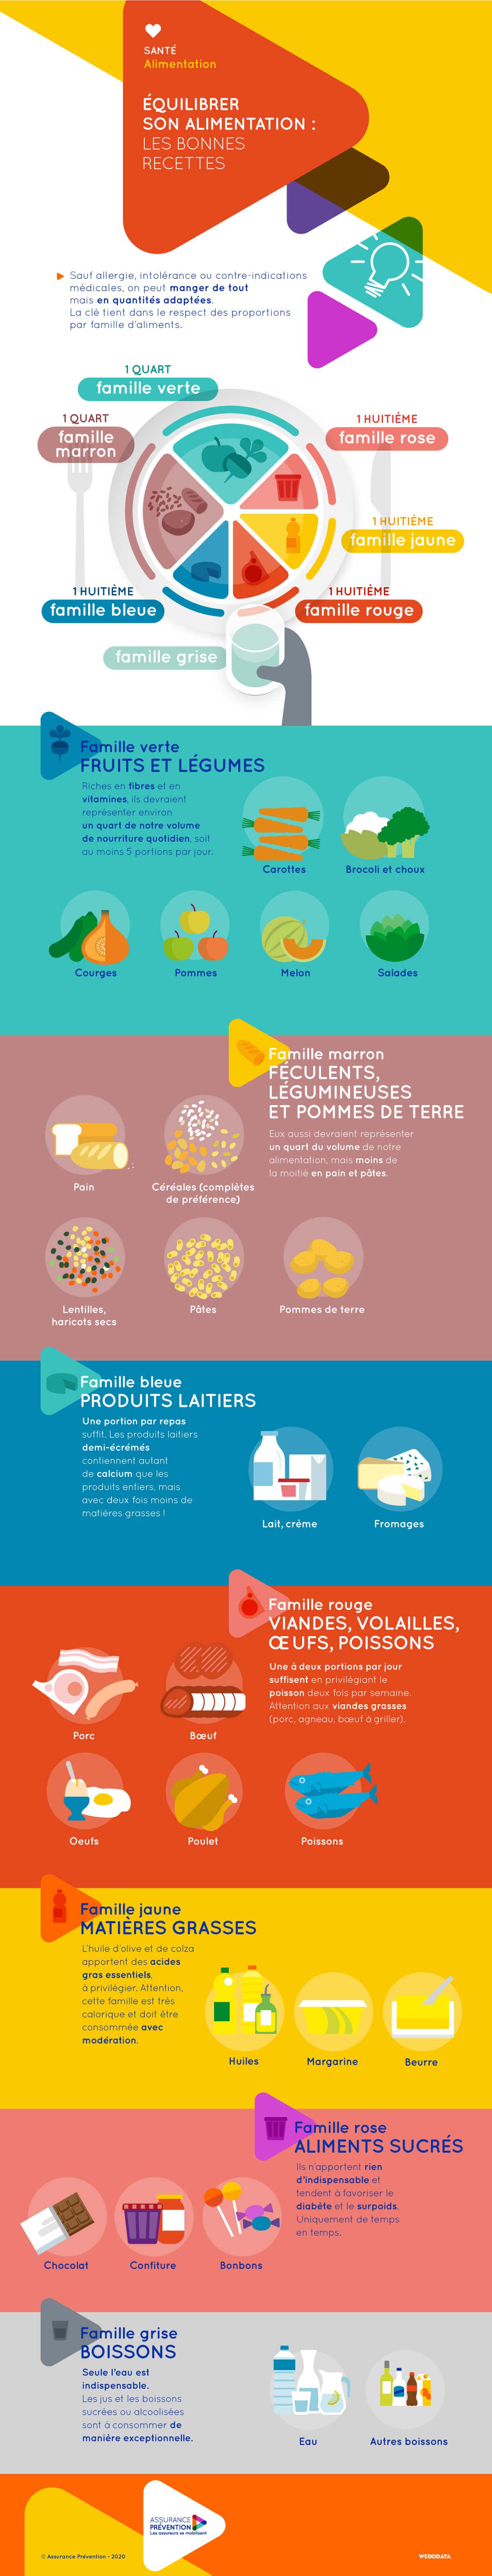 Equilibrer son alimentation : les bonnes recettes Infographie